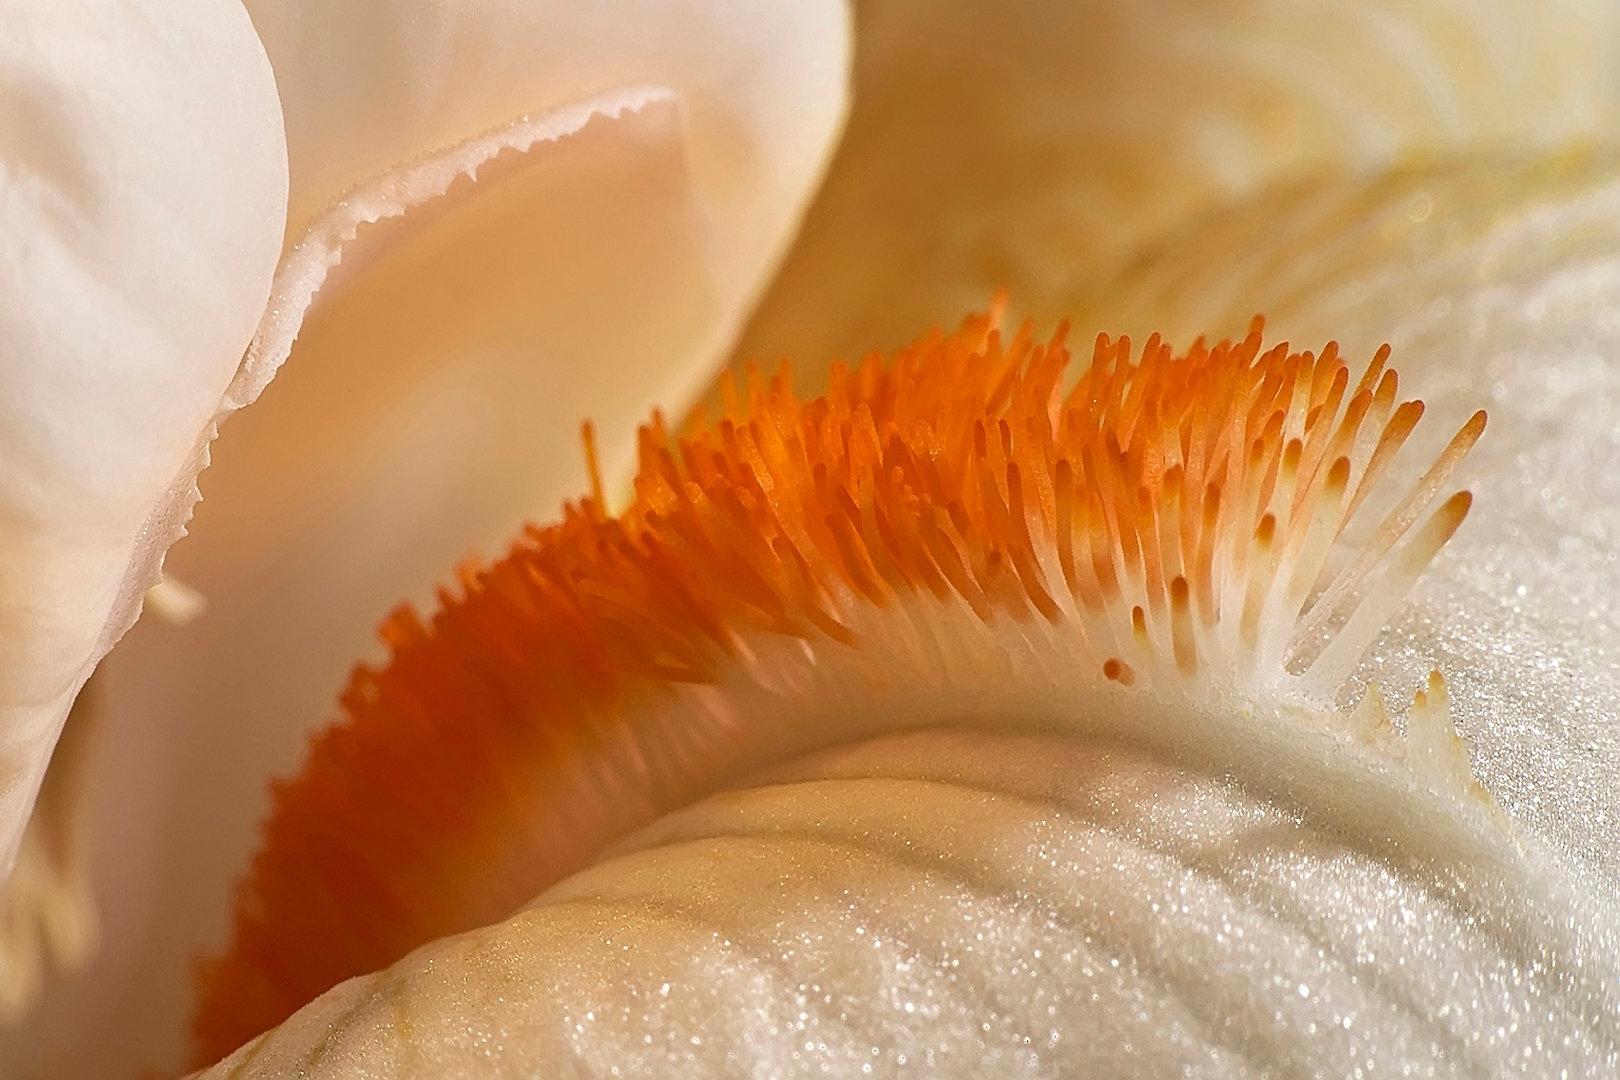 FLOWER Nº 2  Photographie d'art grand format par Denis Eugène Robert sur TRAGART